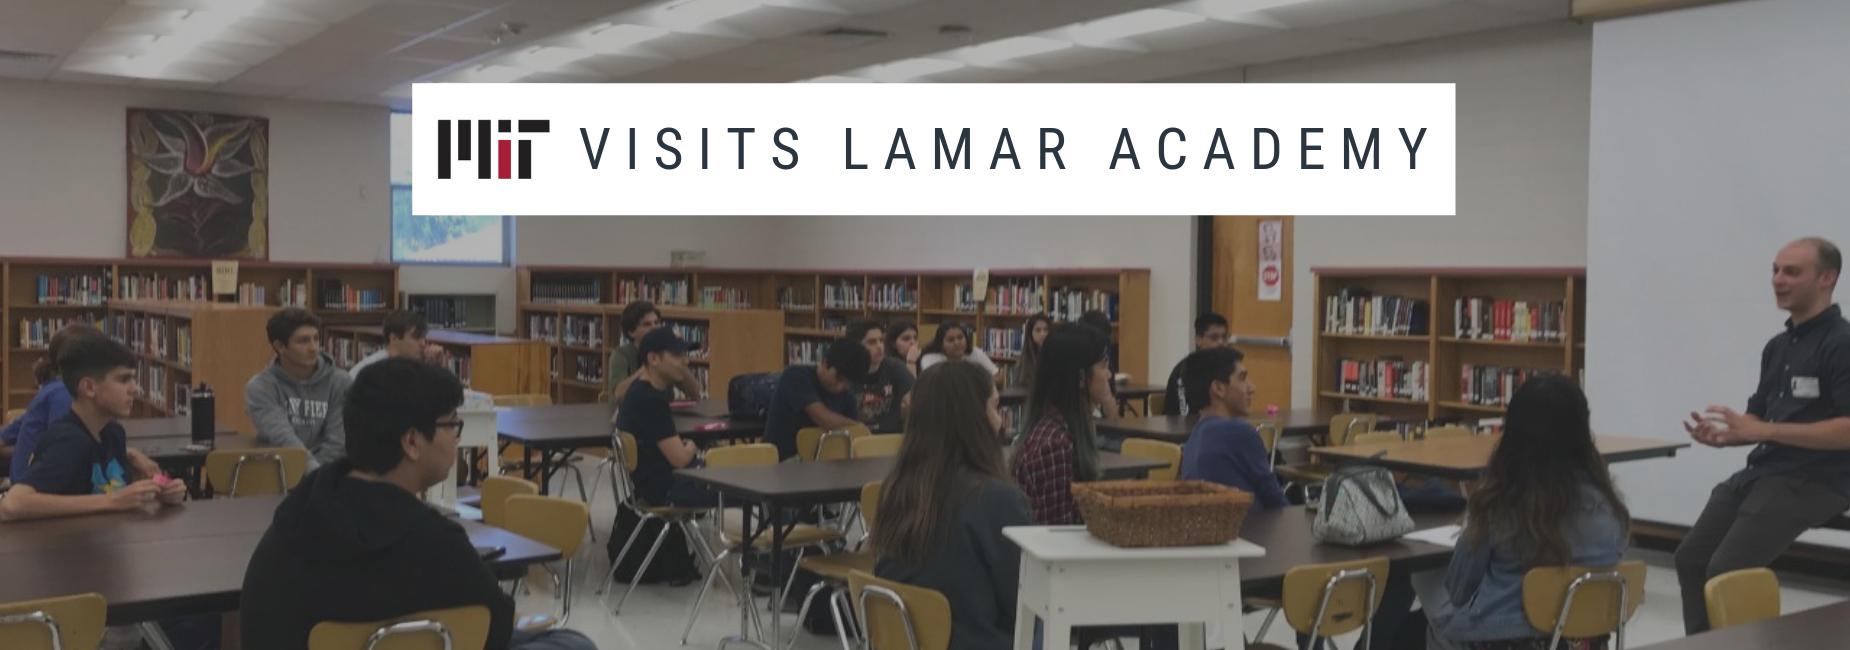 MIT visits Lamar Academy